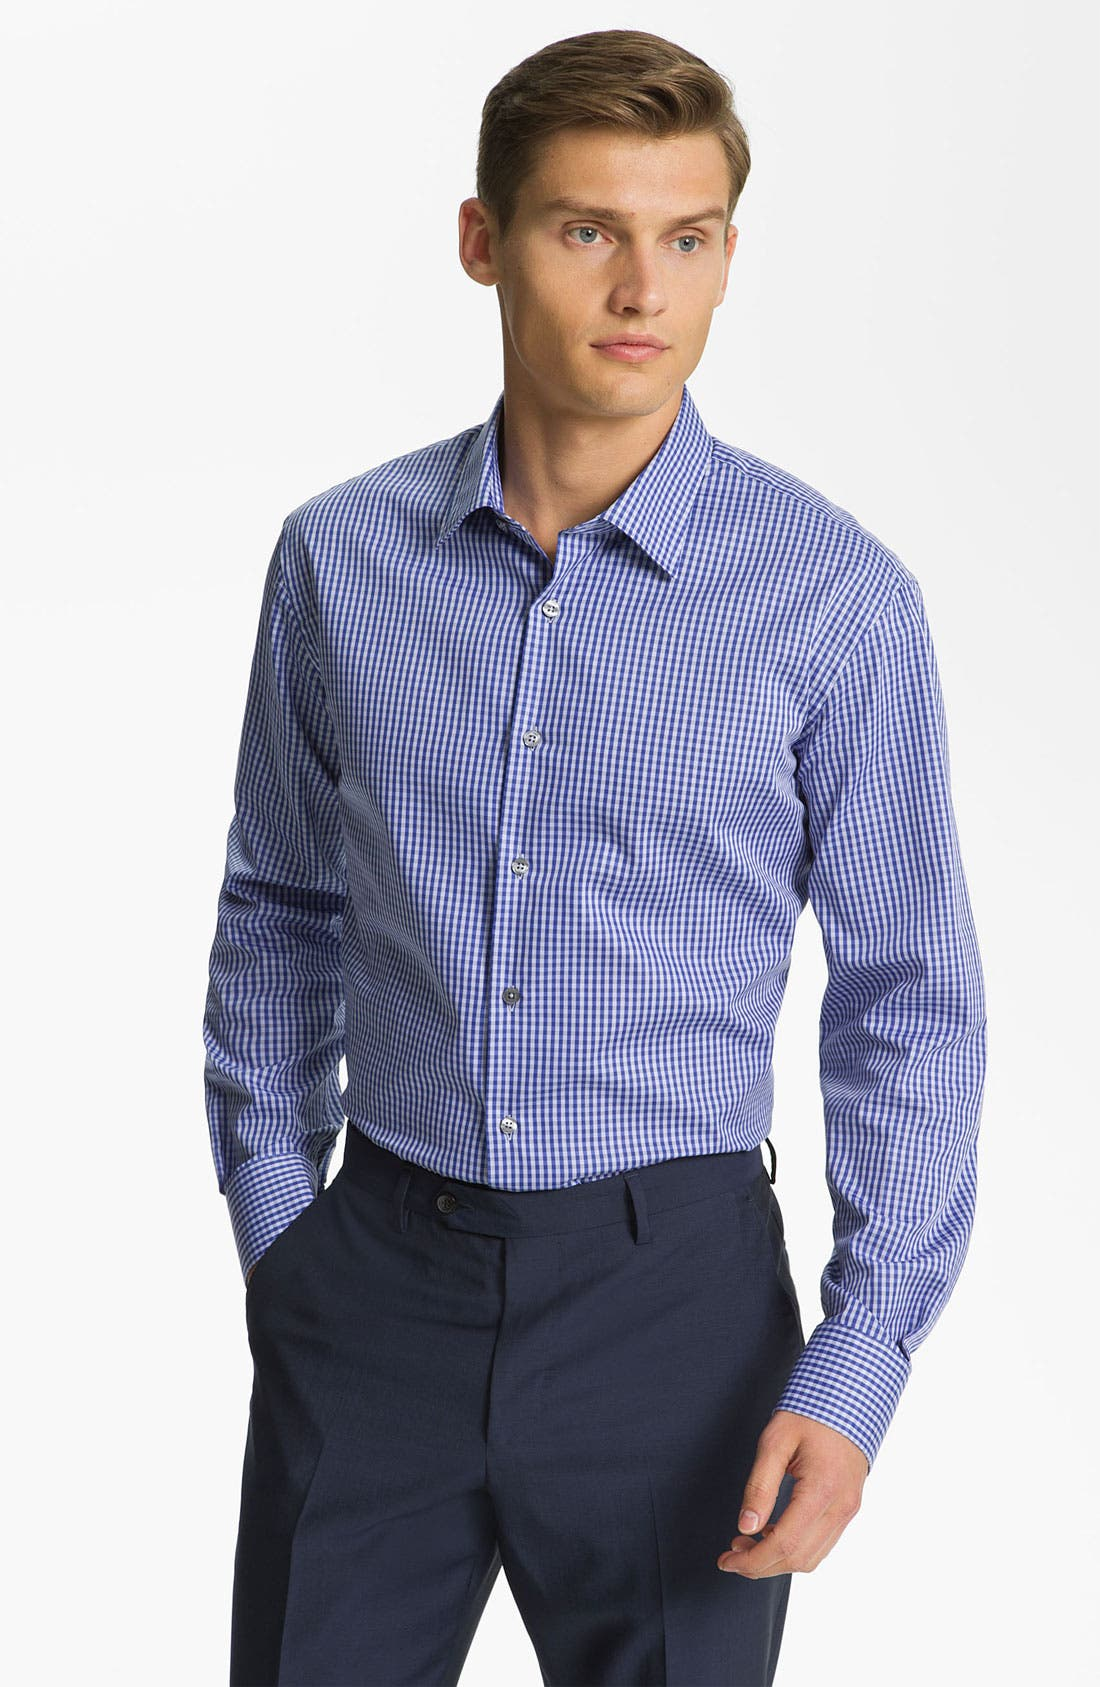 Alternate Image 1 Selected - Paul Smith London Gingham Check Dress Shirt